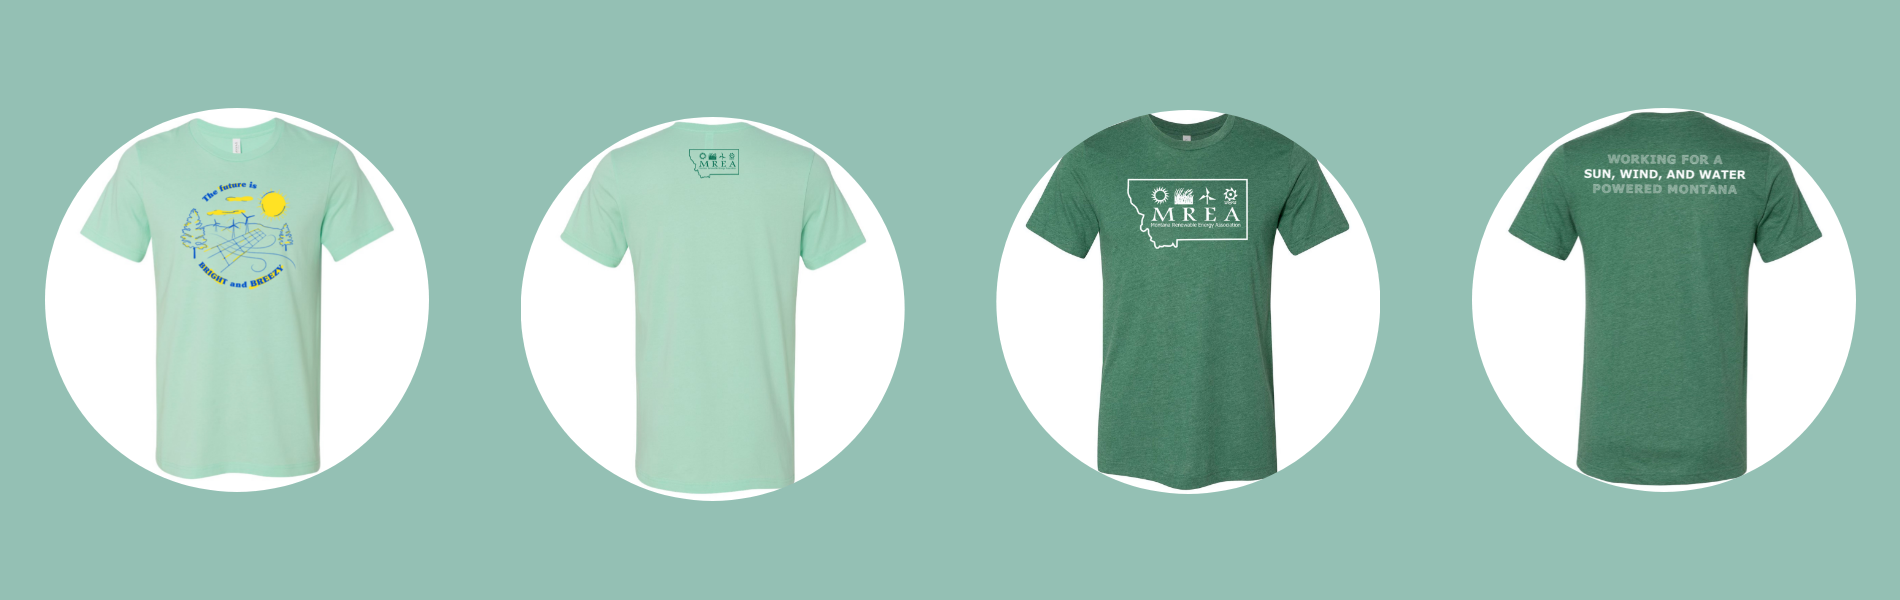 MREA T-shirts